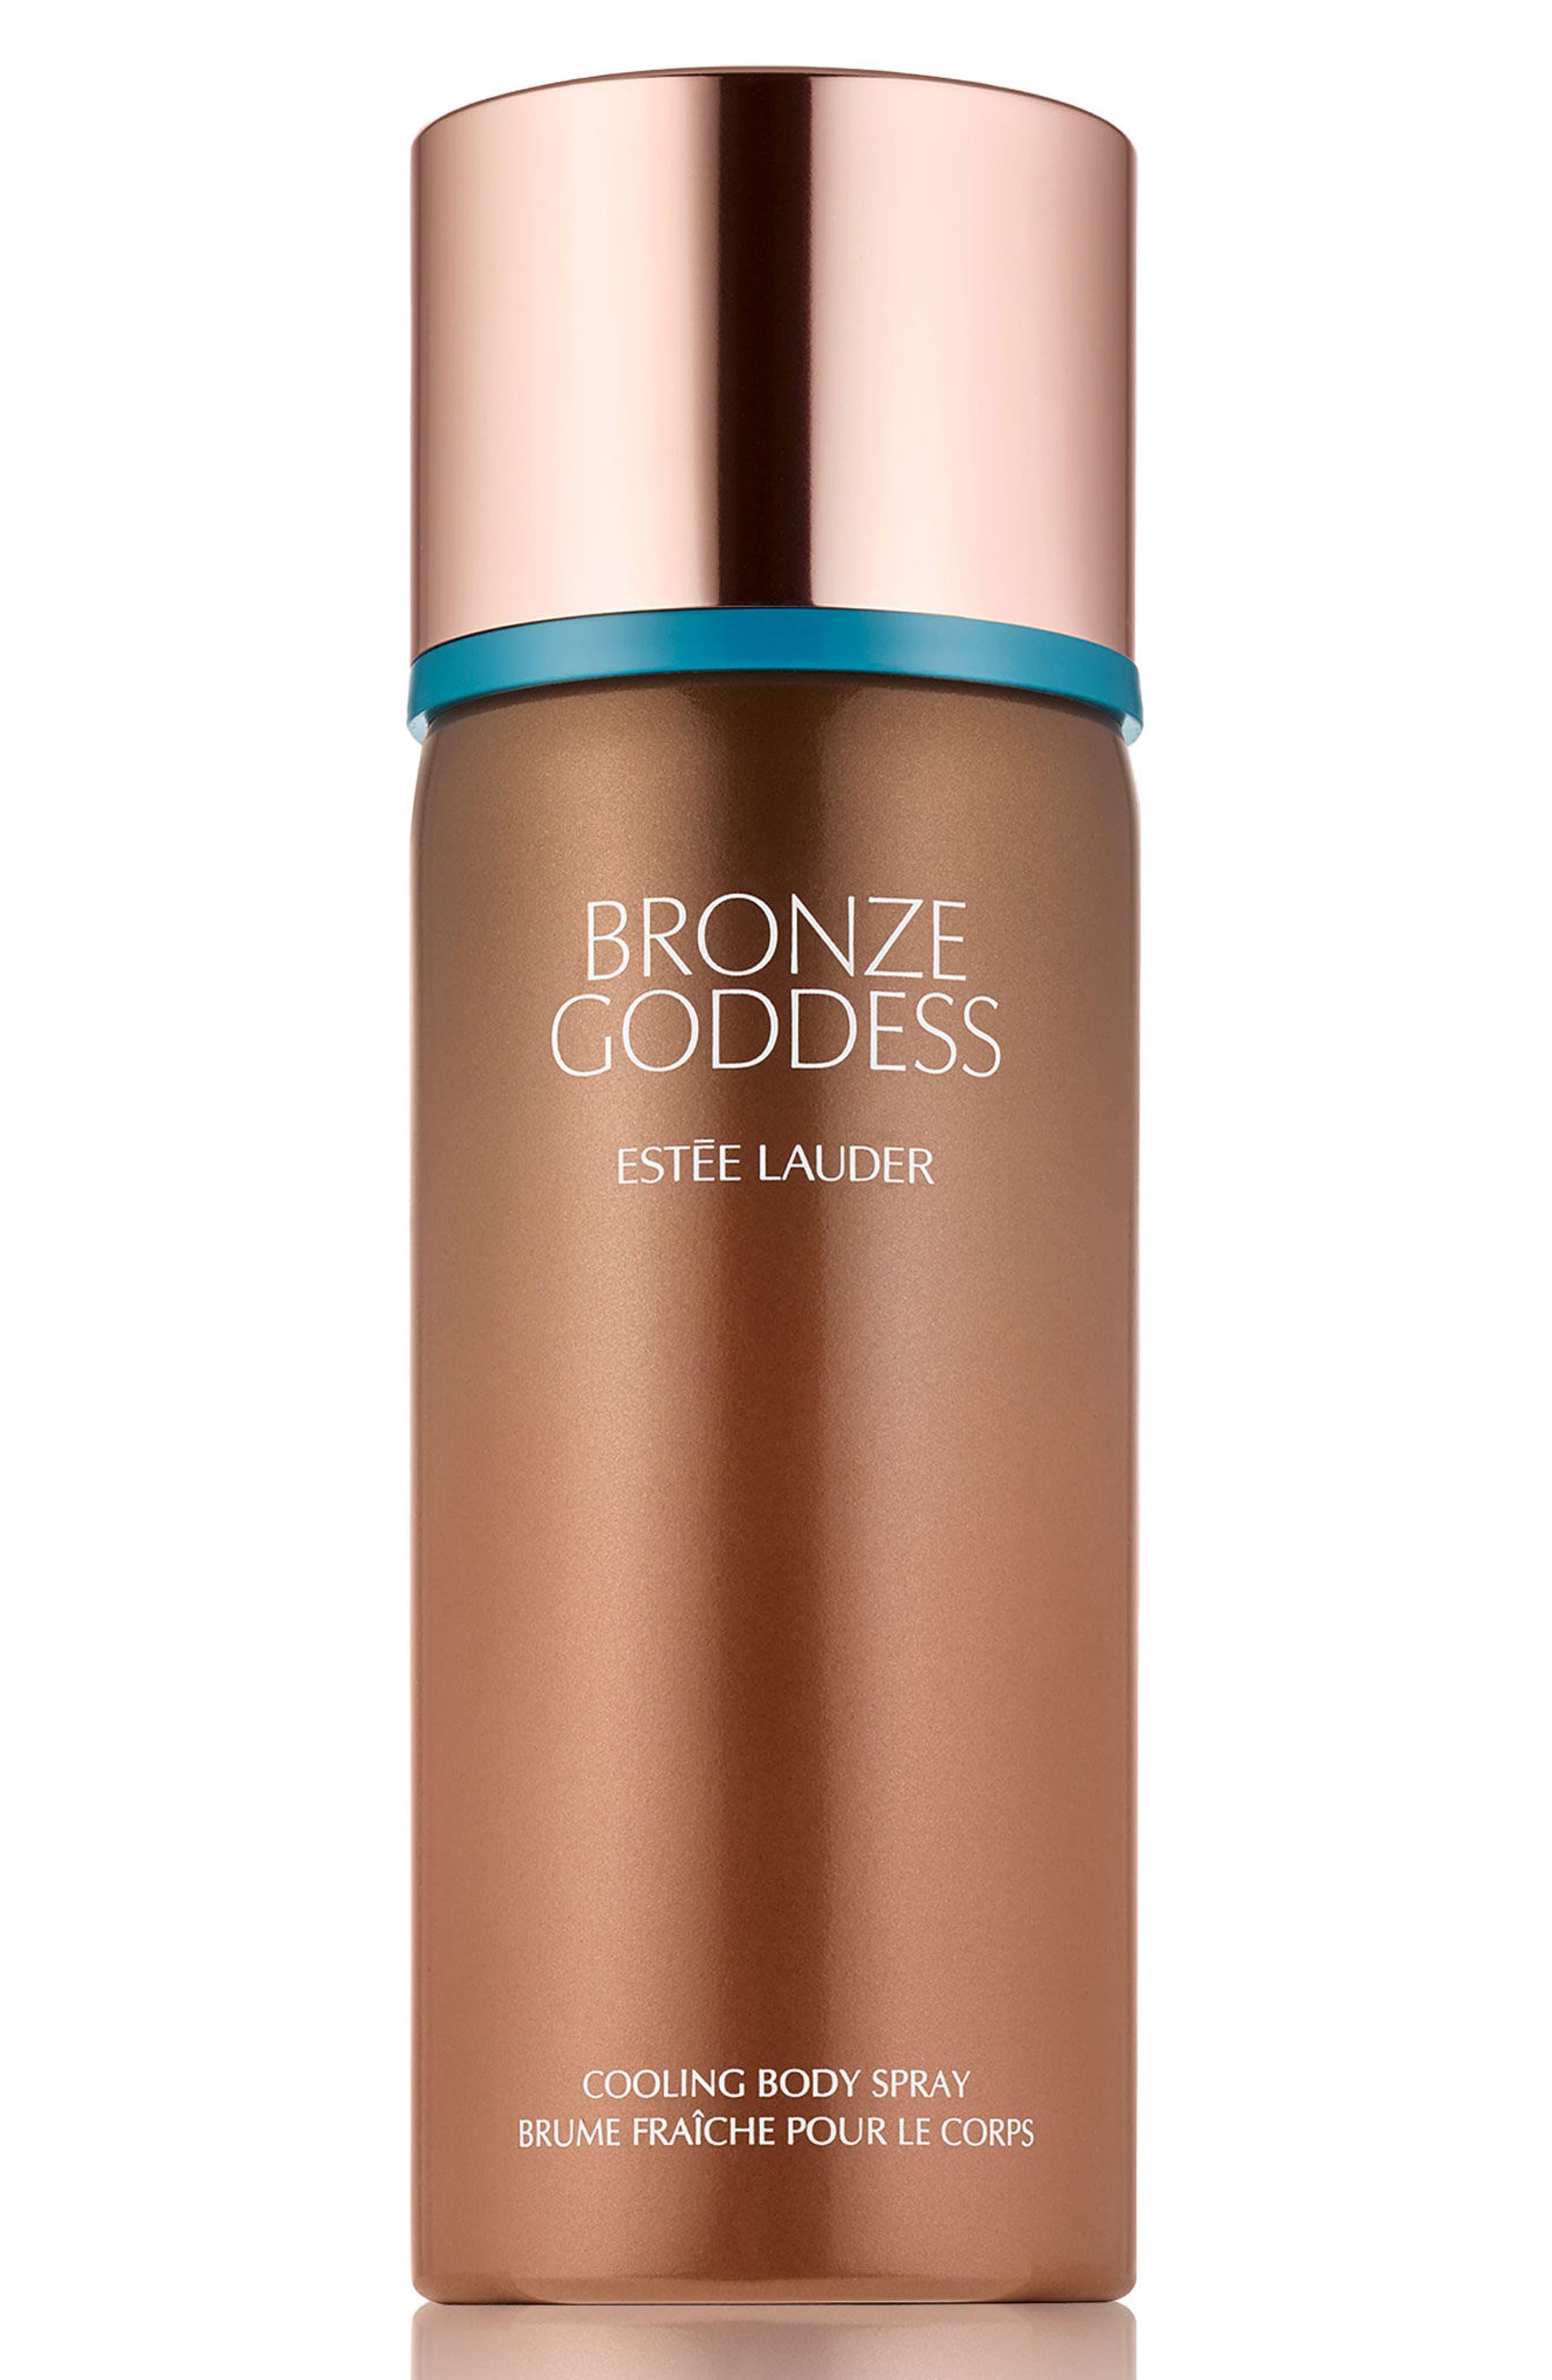 Bronze Goddess Cooling Body Spray,                             Main thumbnail 1, color,                             NO COLOR